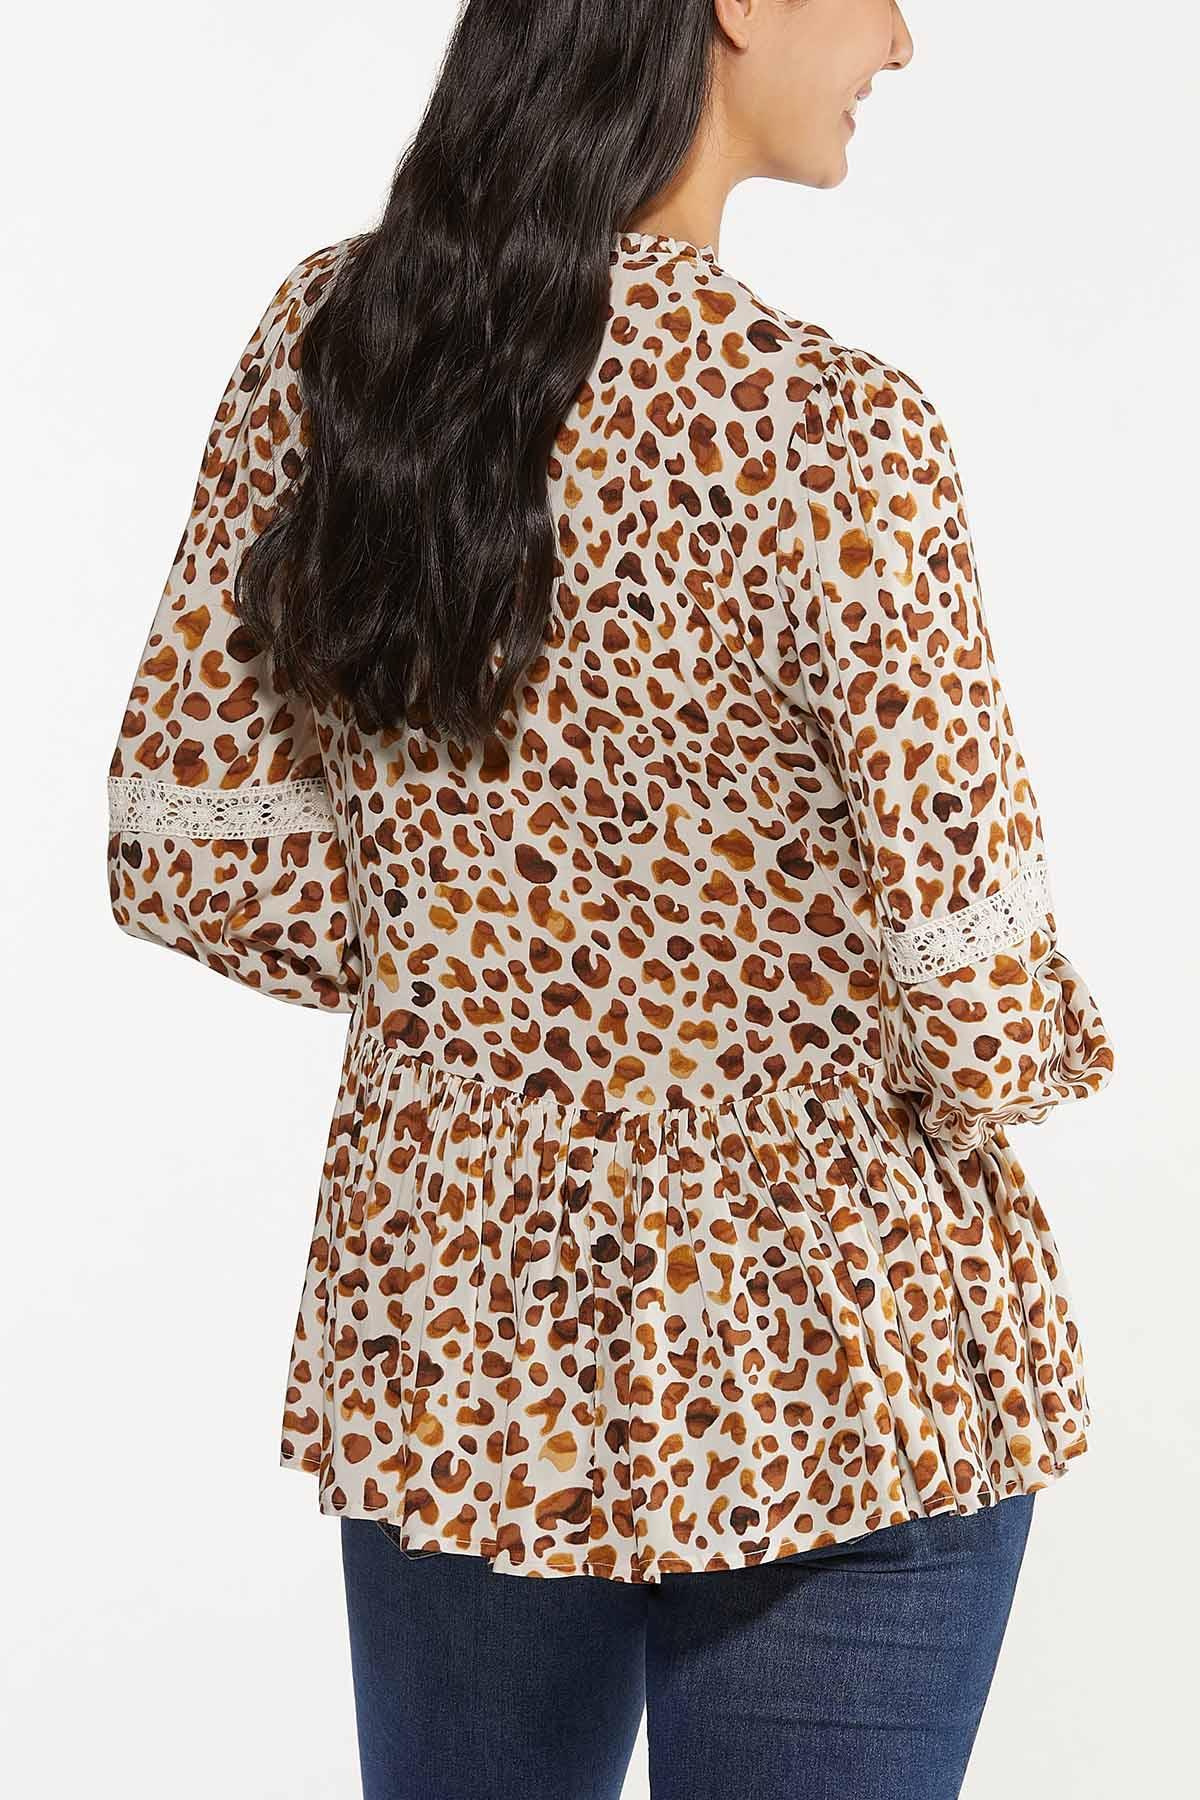 Leopard Peplum Top (Item #44643763)